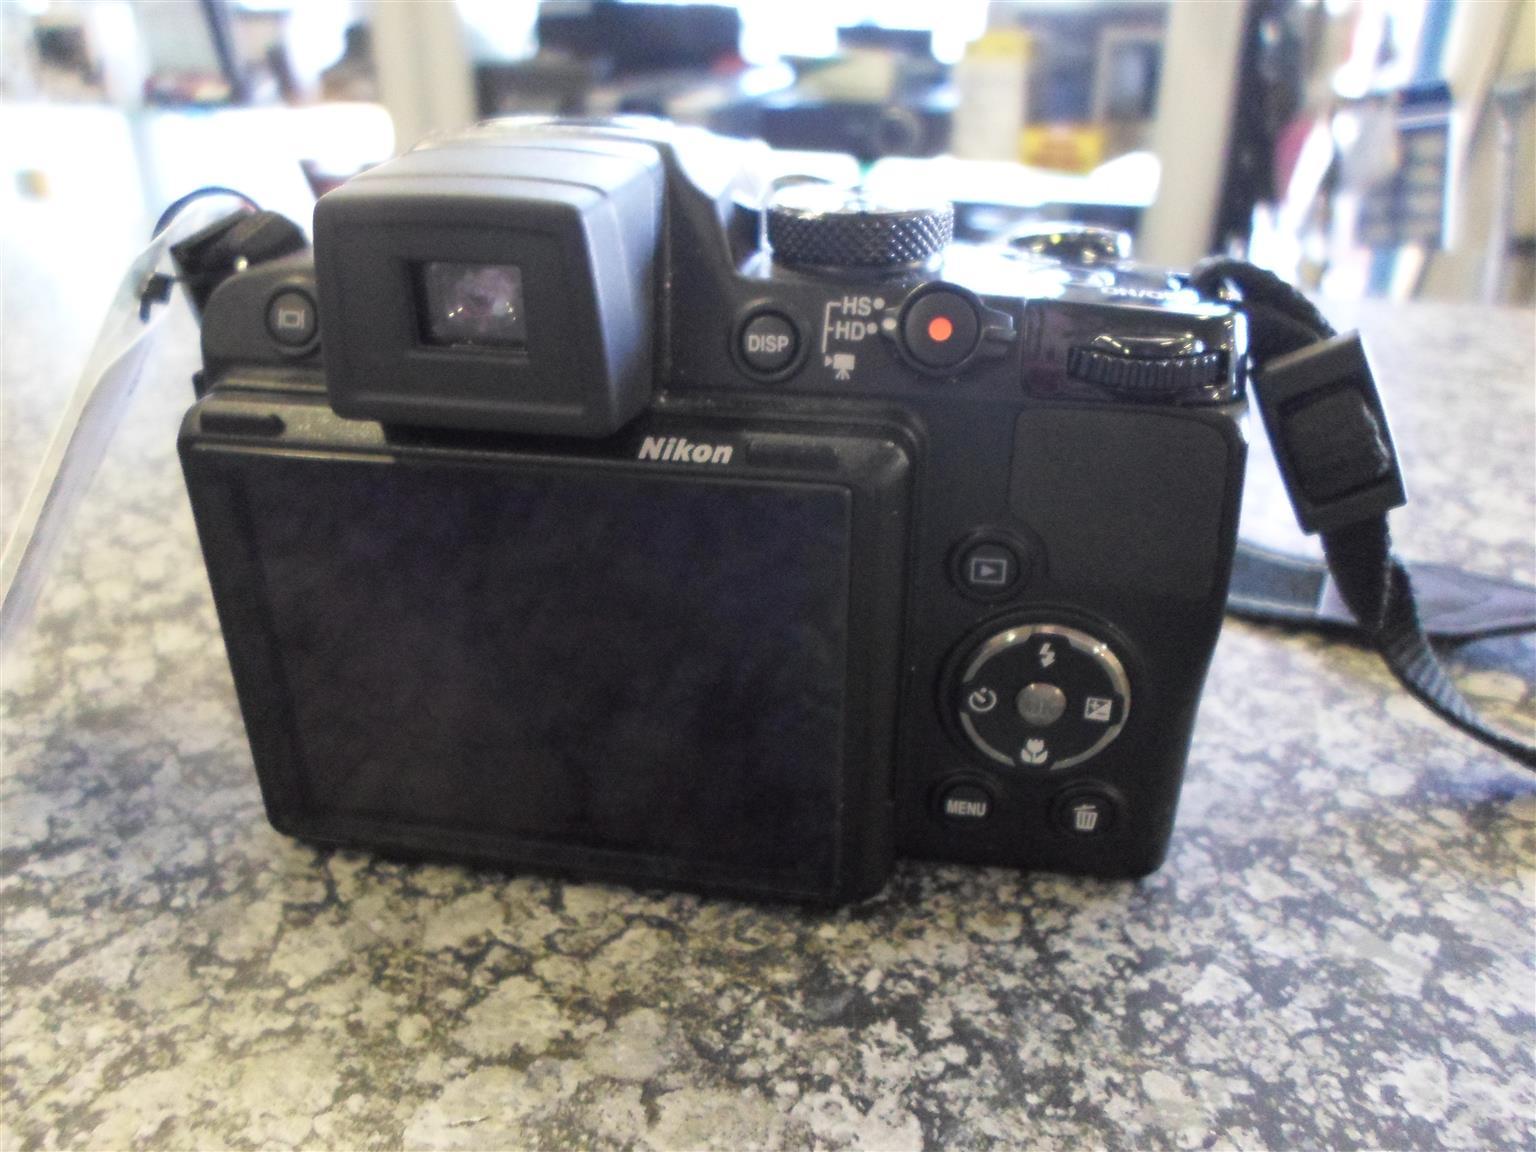 Nikon Coolpix P500 Camera